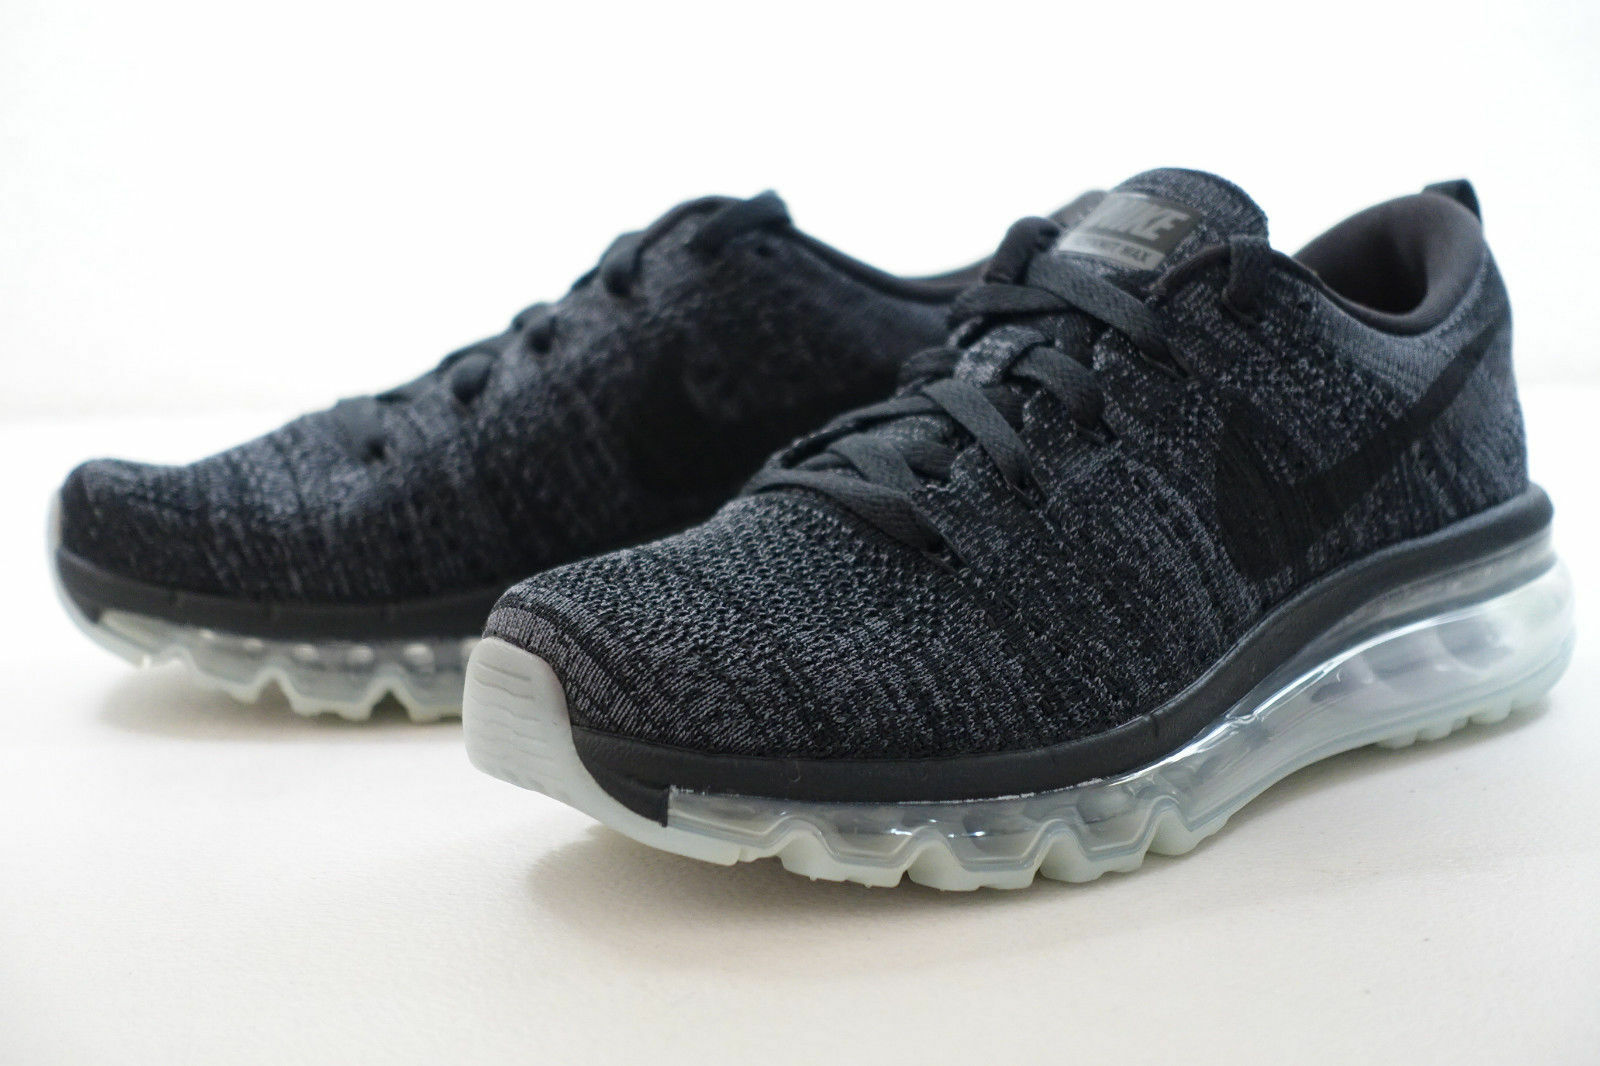 DAMEN Nike Flyknit Max Schuhe Schwarz Grau Anthrazit 620659 620659 620659 010 Msrp 961548